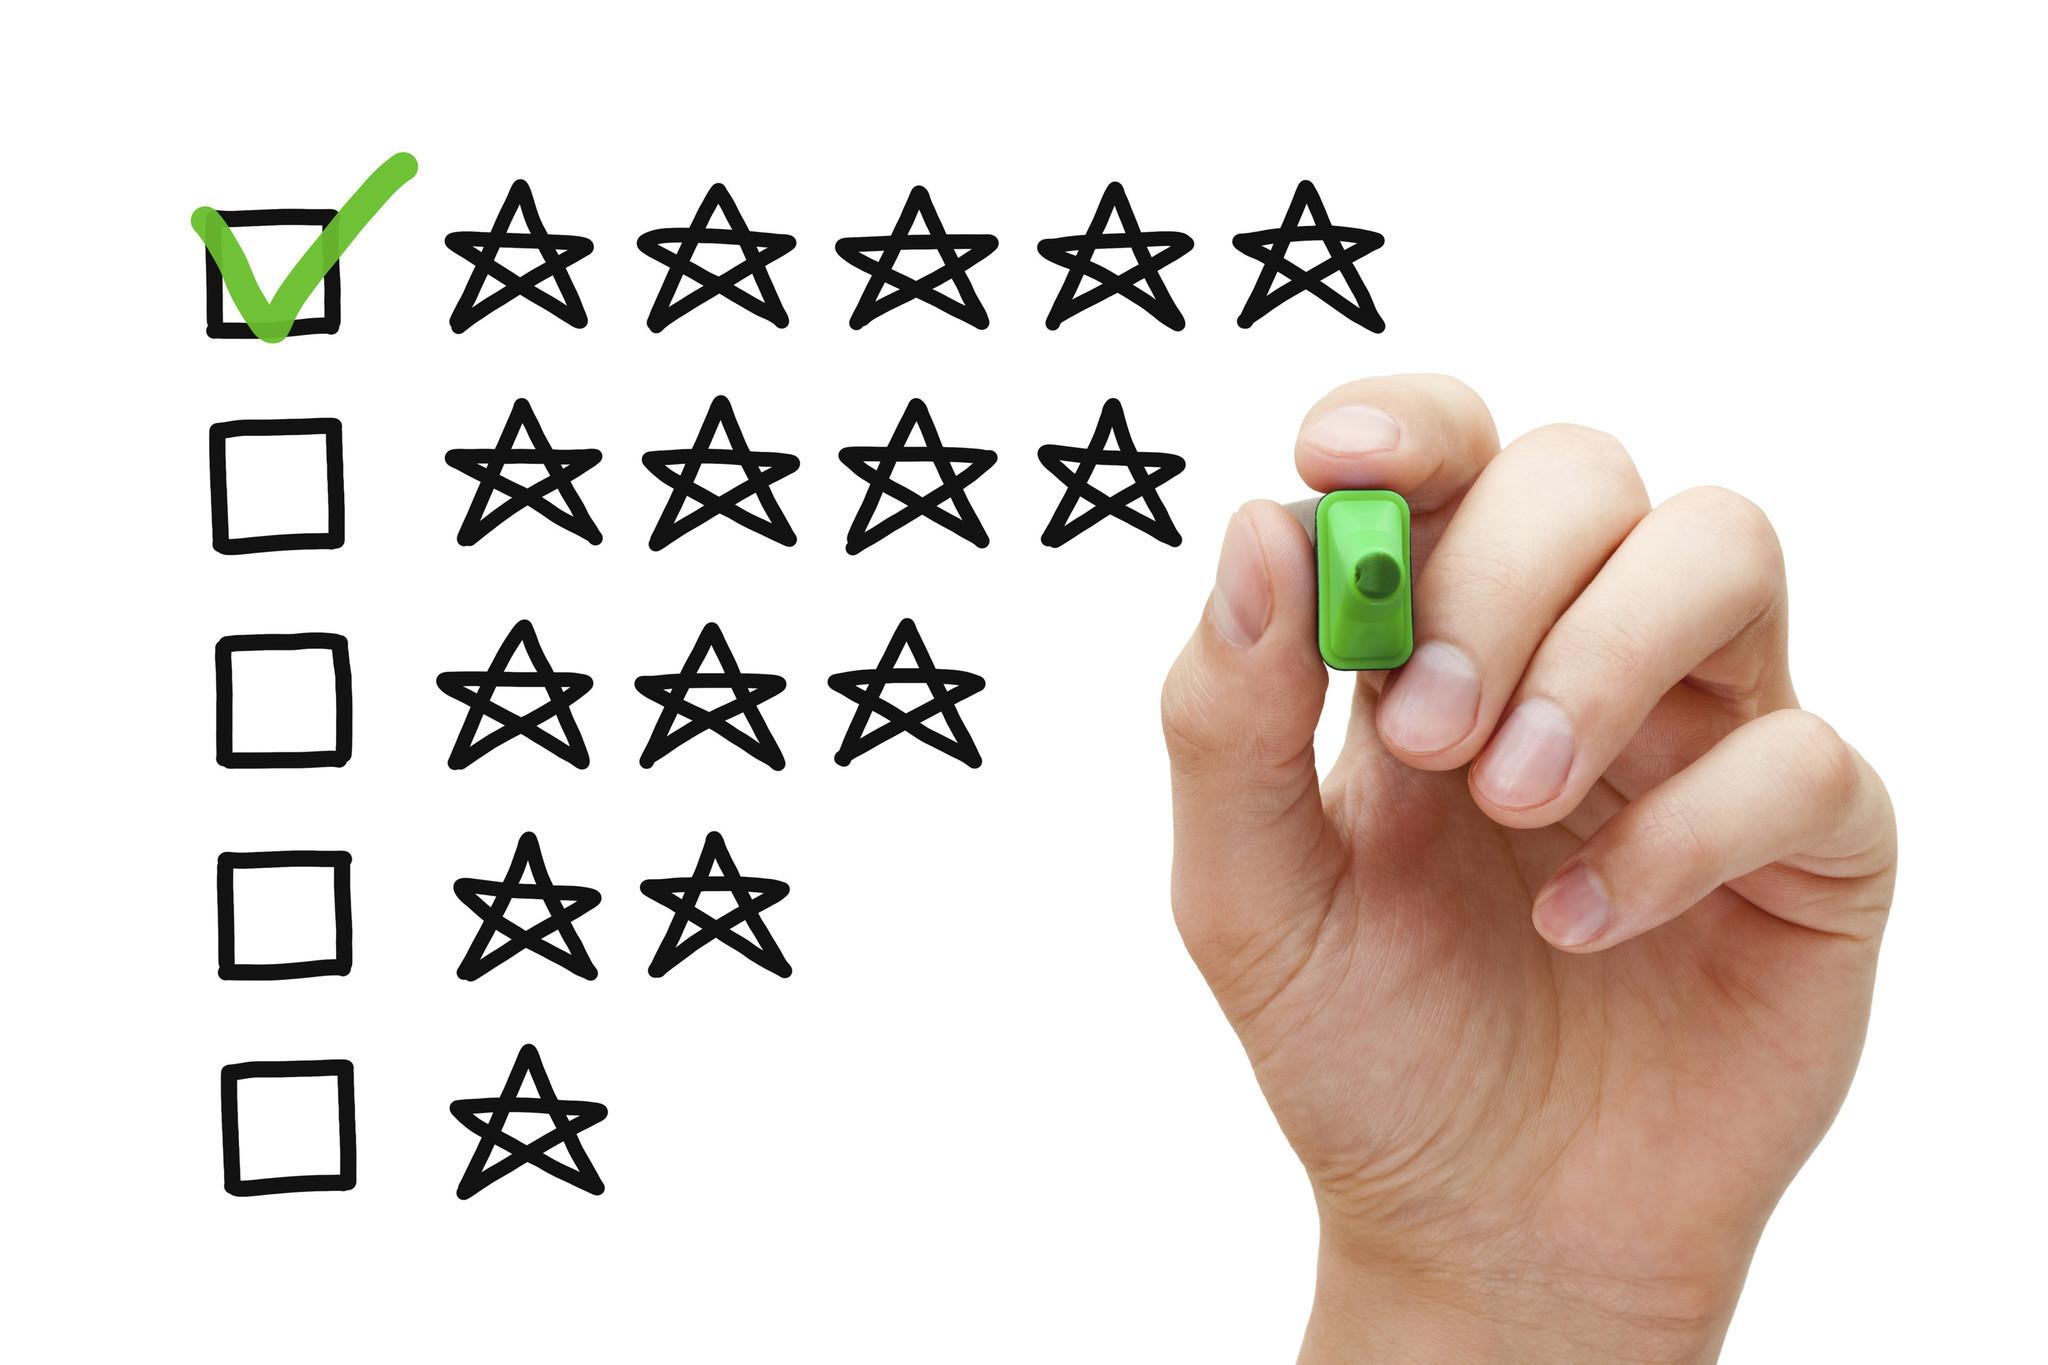 online reviews. digital marketing trends, york maine seo